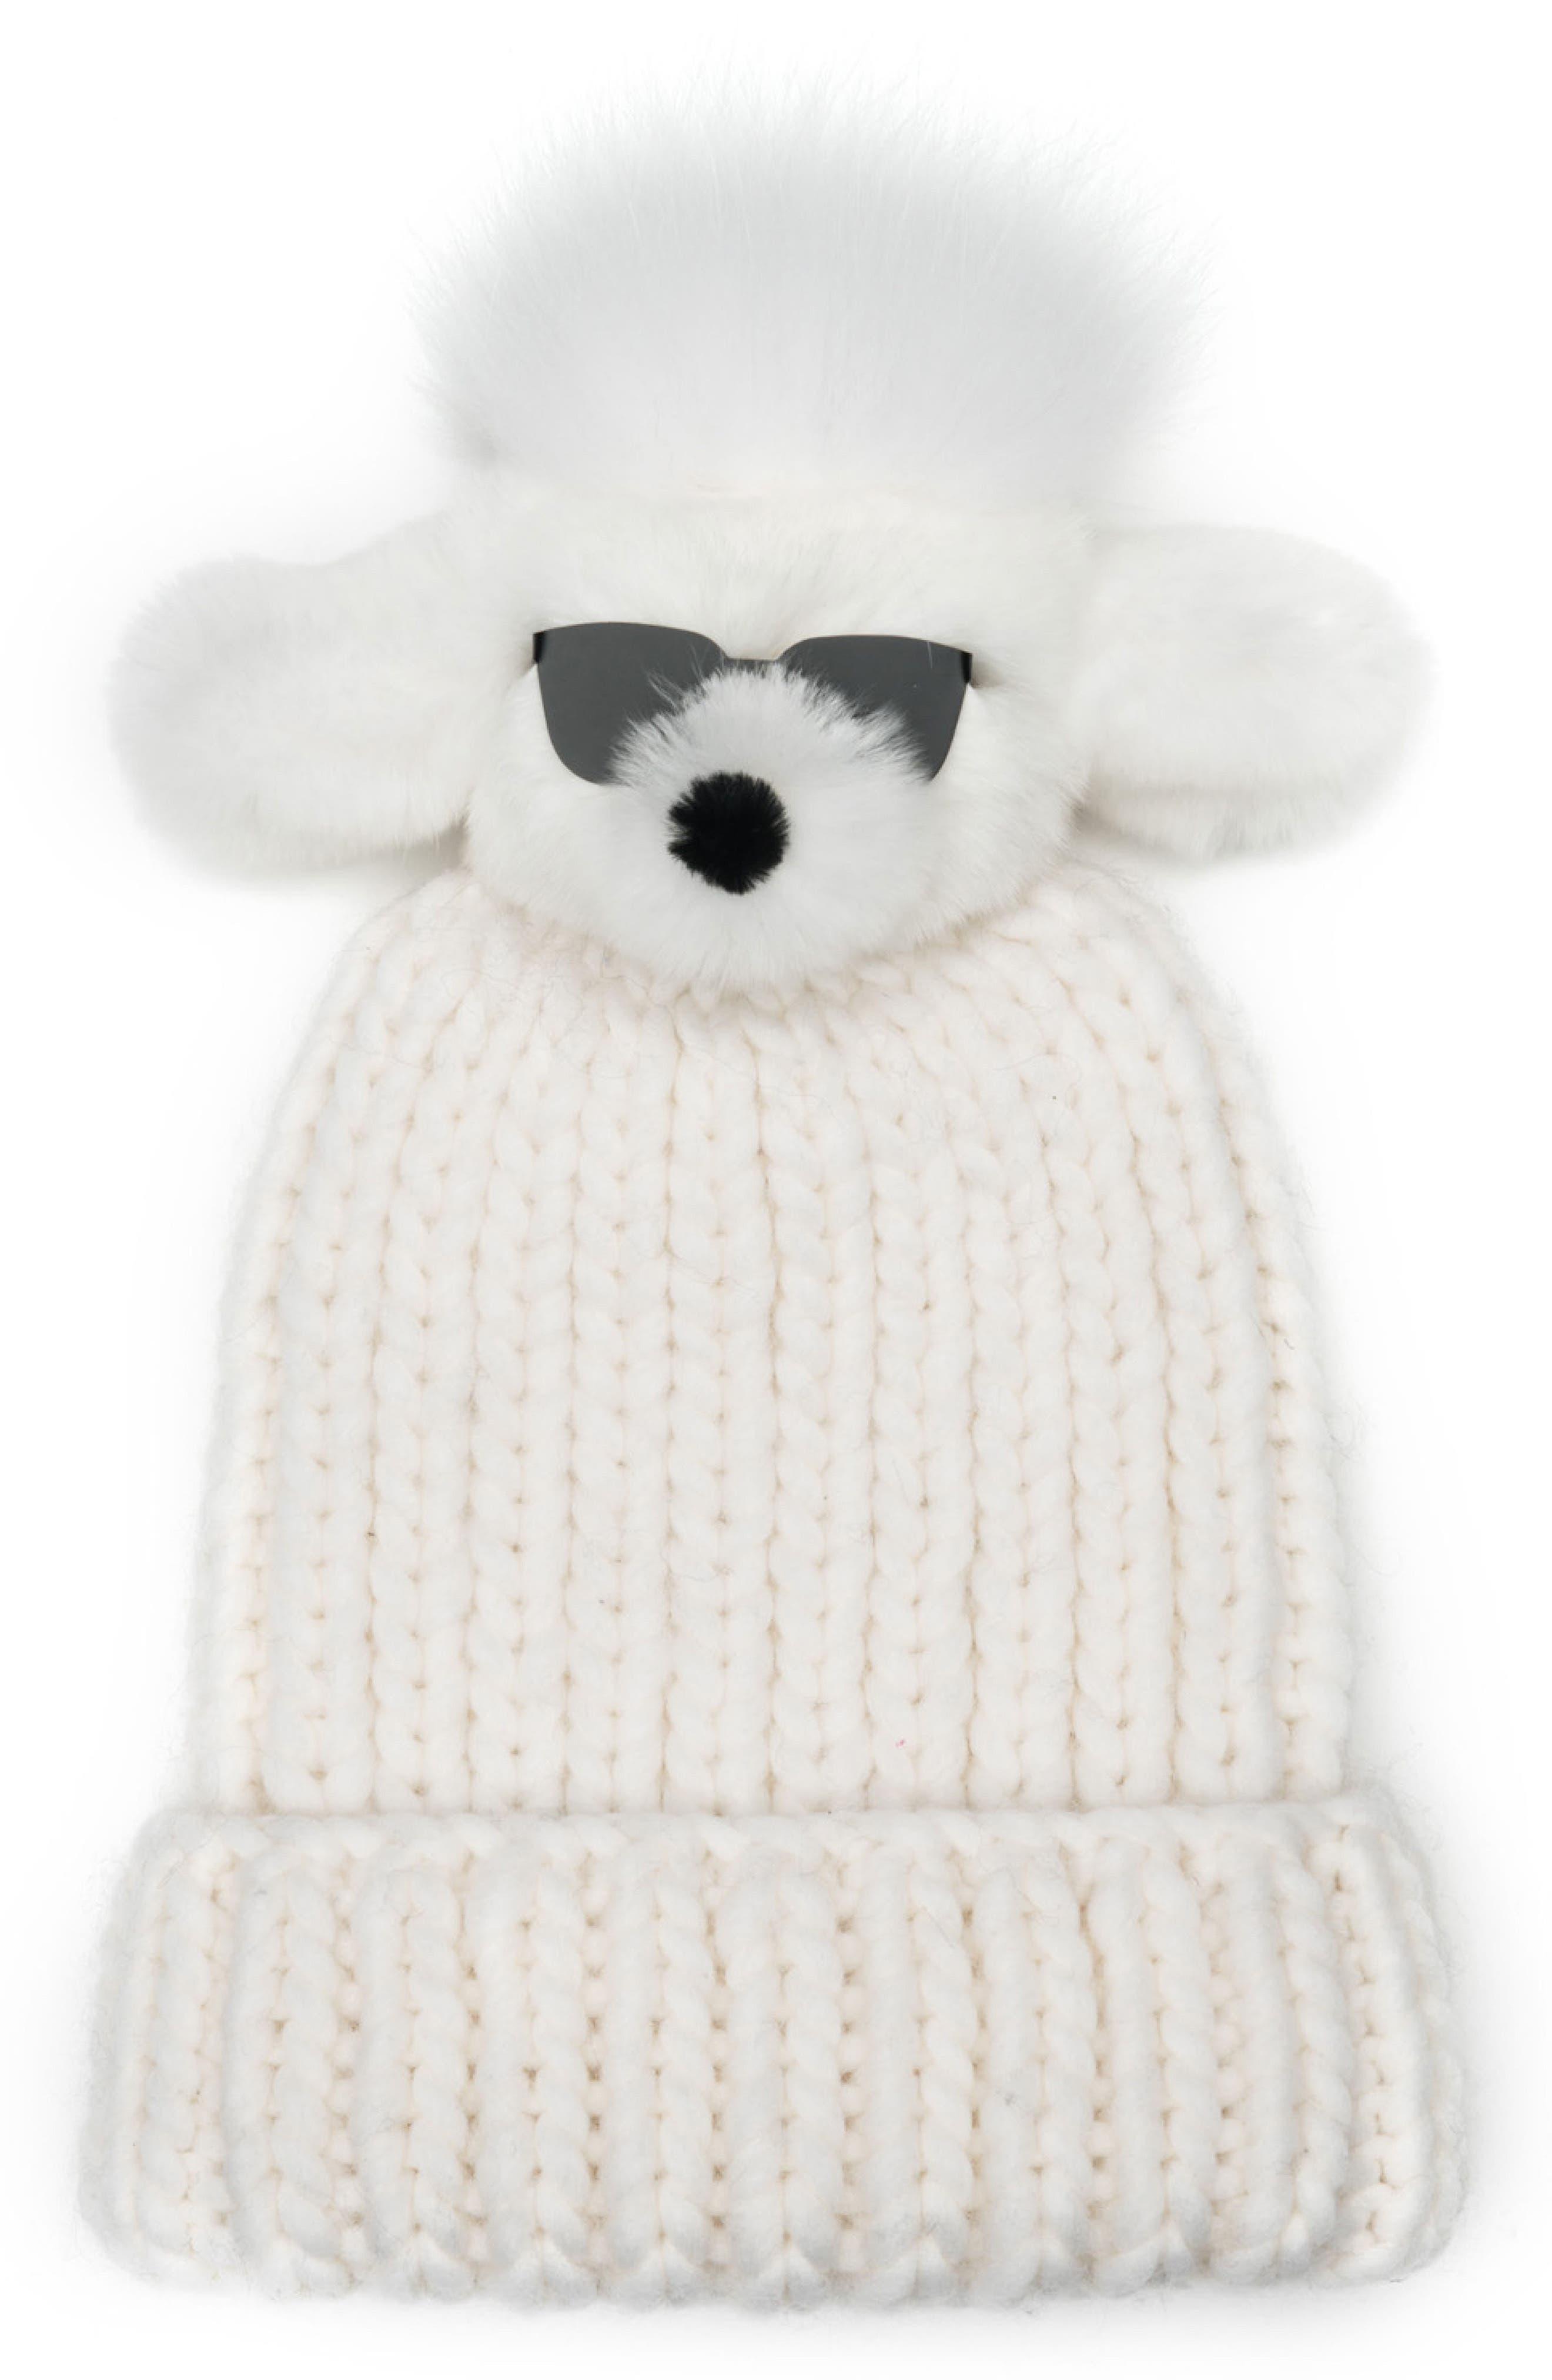 Alternate Image 1 Selected - Eugenia Kim Rain Wool Stocking Cap with Genuine Fox Fur Pom